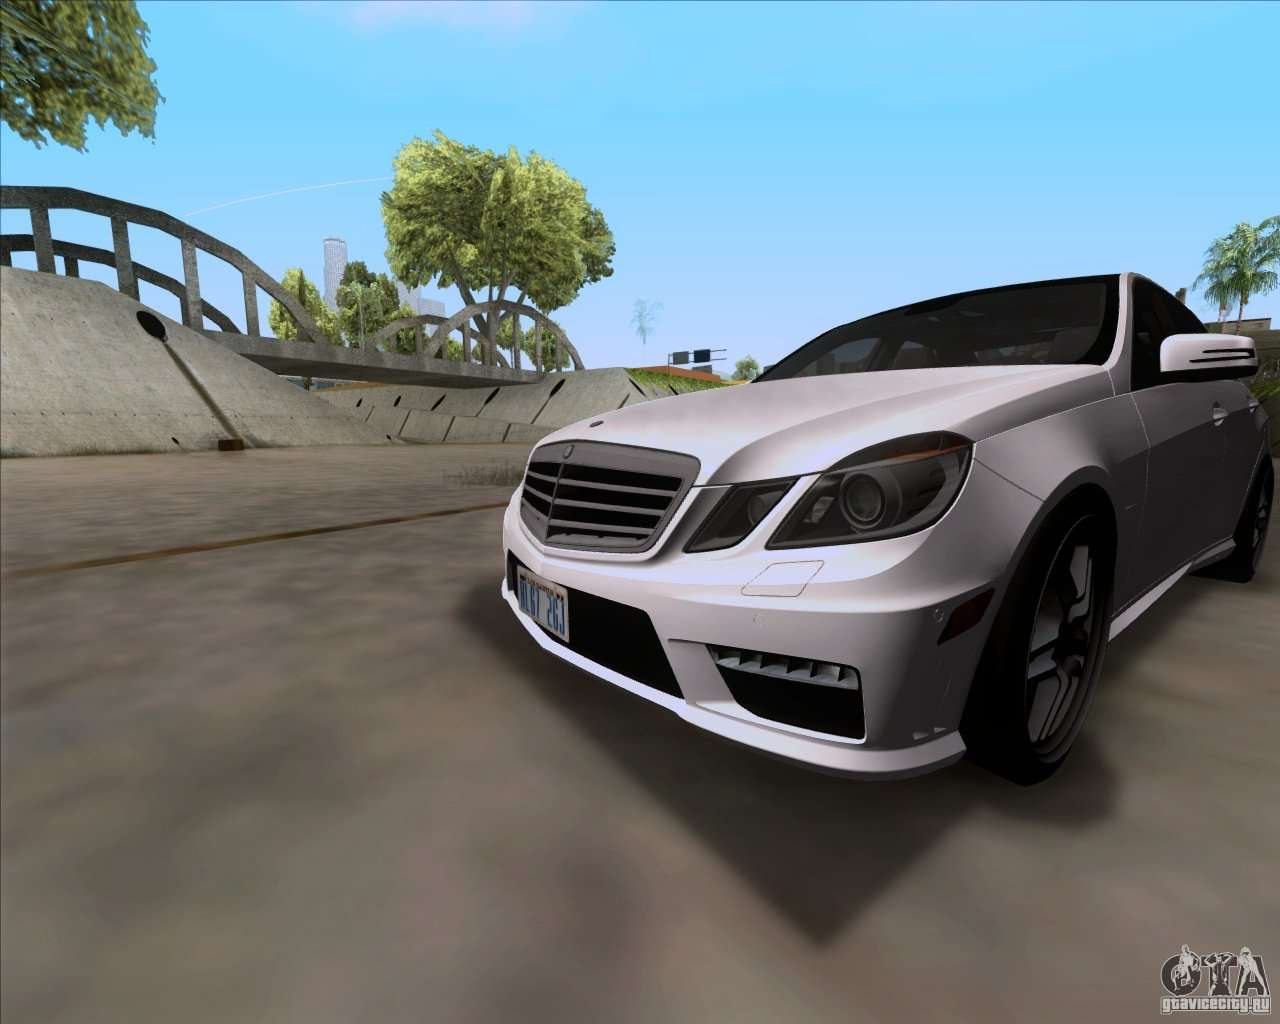 Mercedes benz e63 amg v12 tt black revel for gta san andreas for V12 mercedes benz